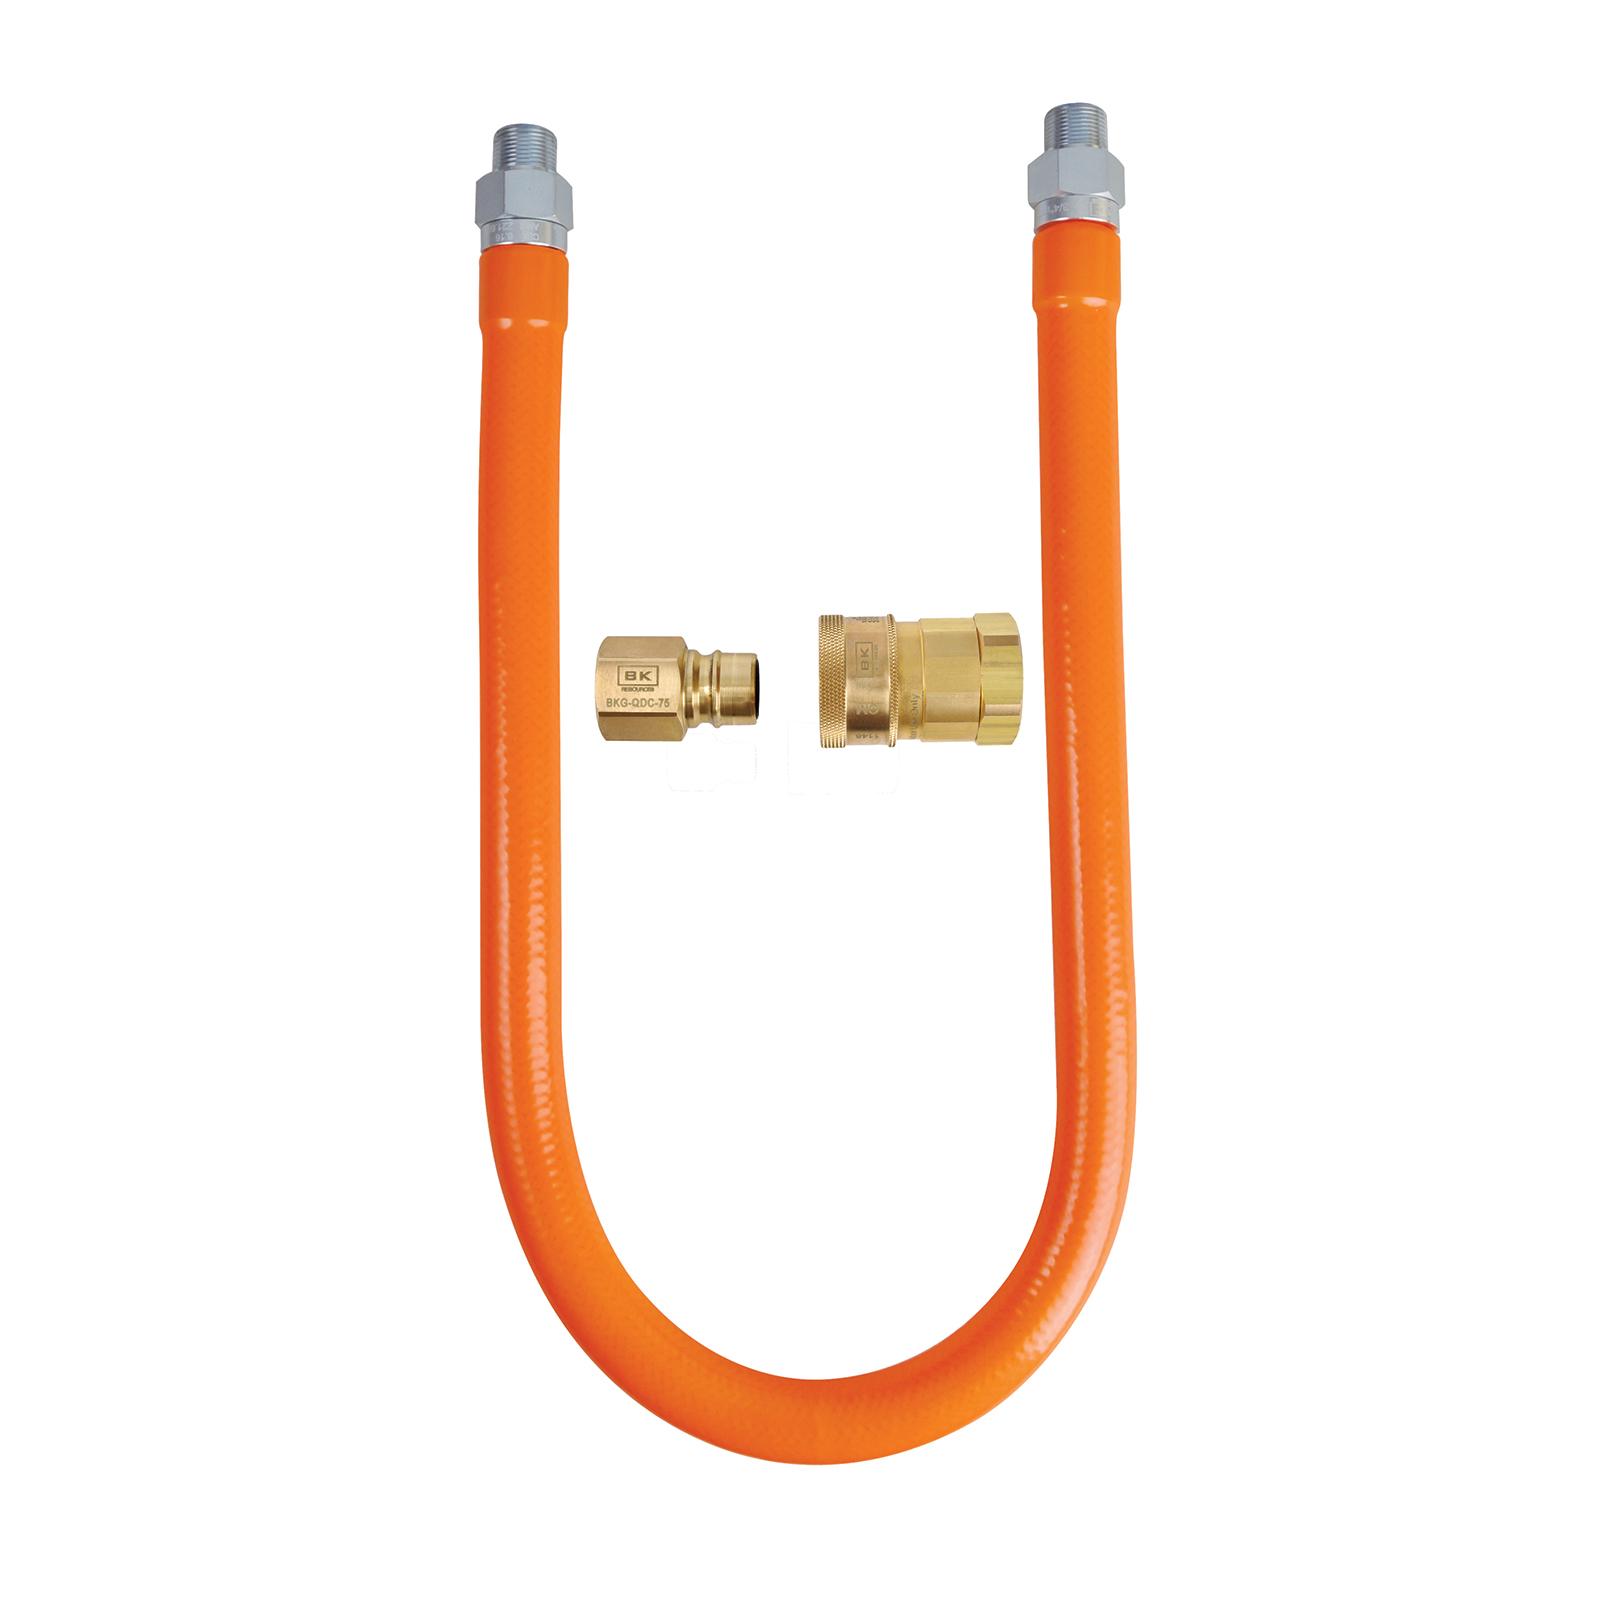 BK Resources BKG-GHC-10036-QD-PT gas connector hose kit